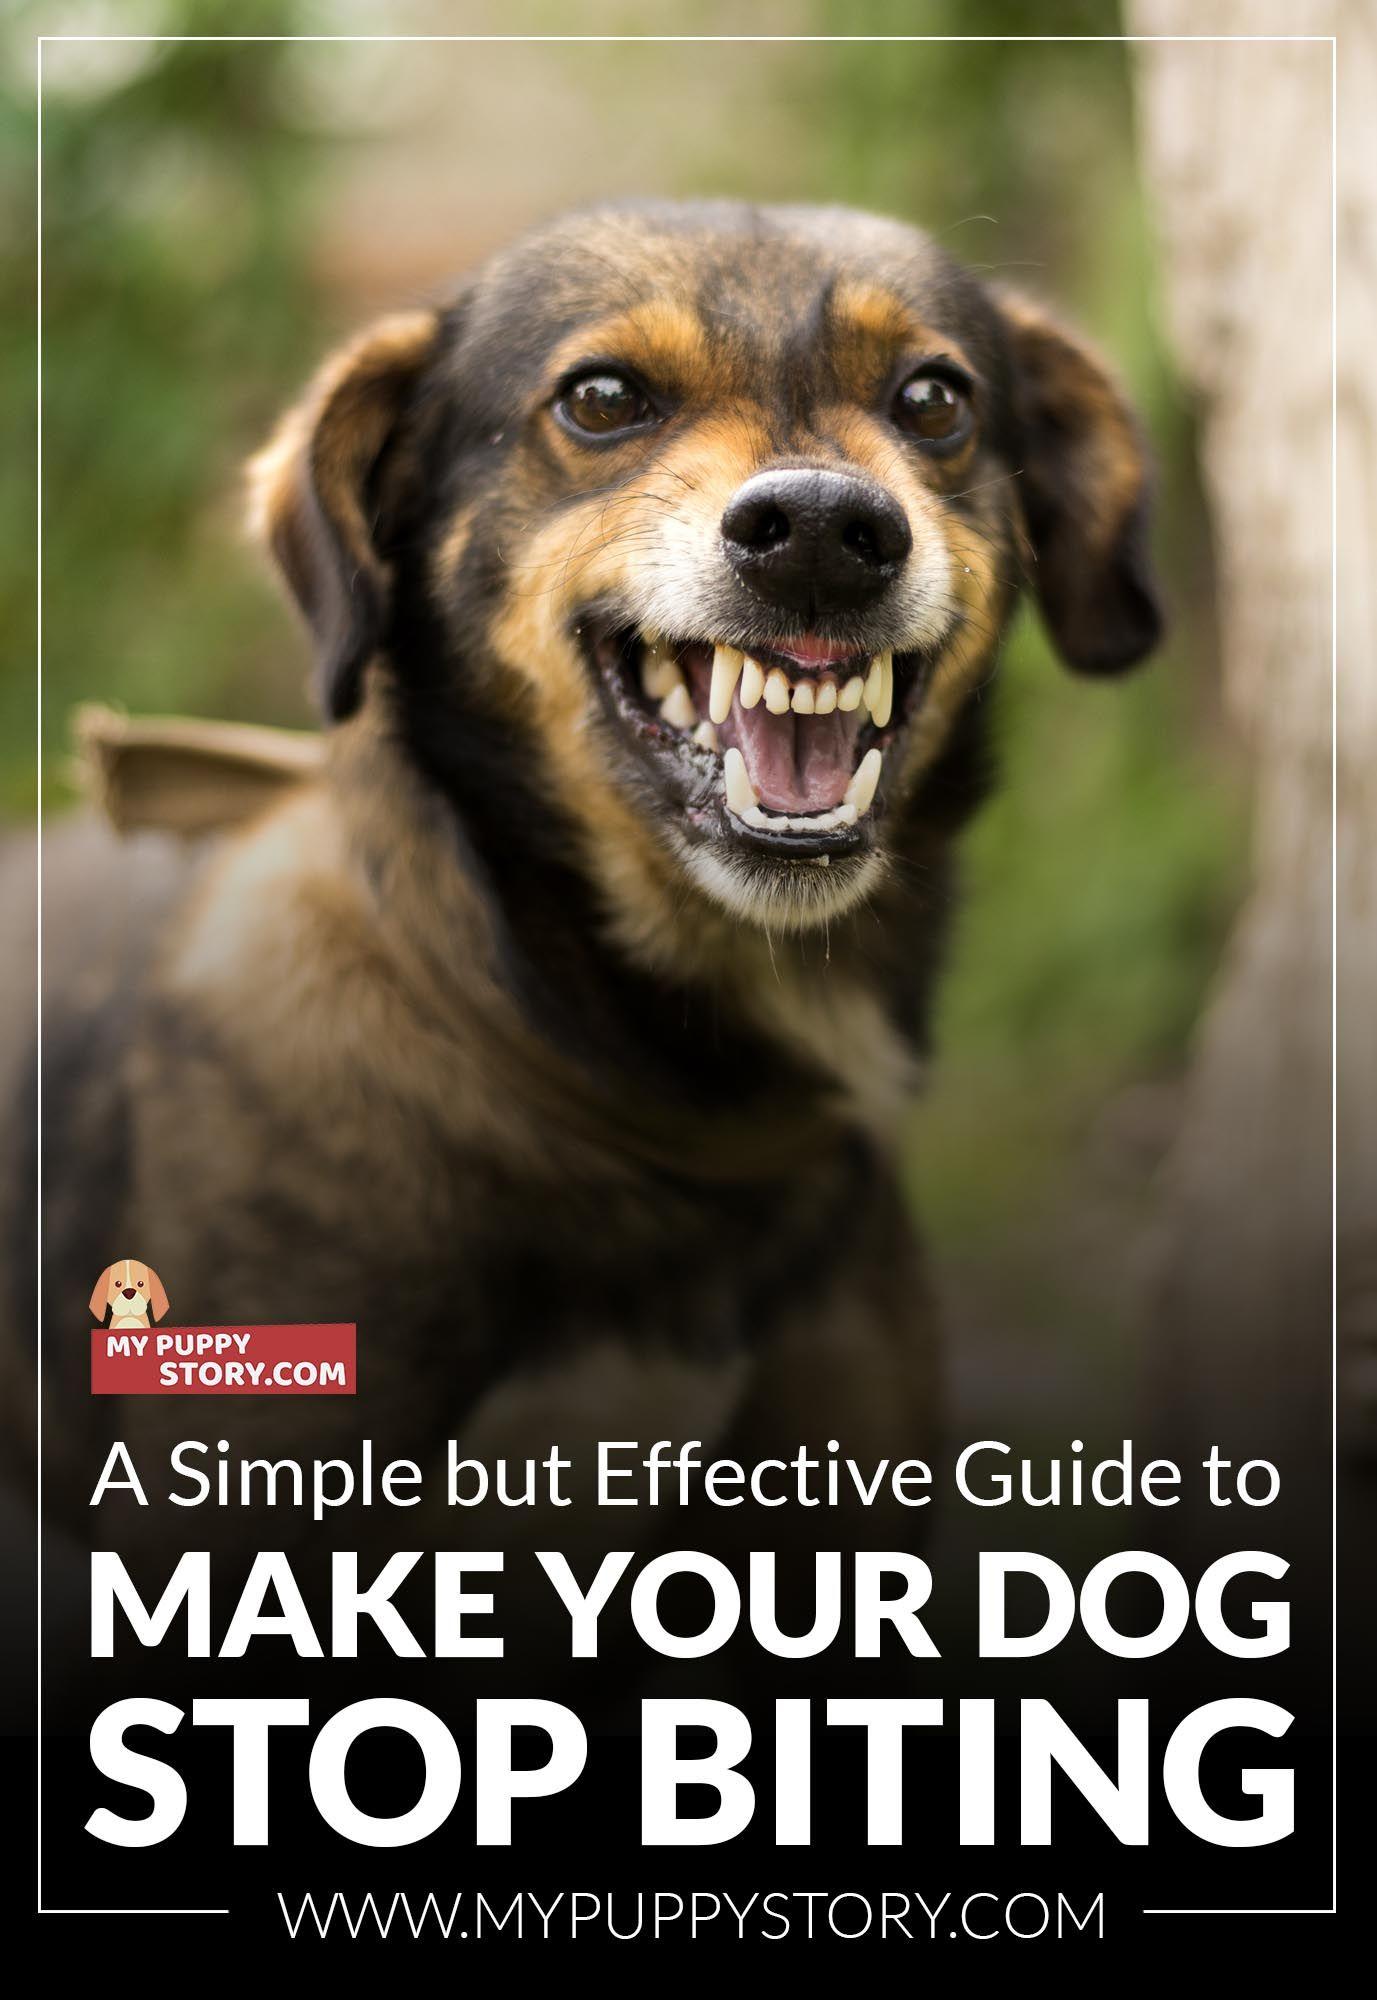 8d351f03700804b203b566853d6c5e9b - How To Get A Dog To Stop Aggressive Biting